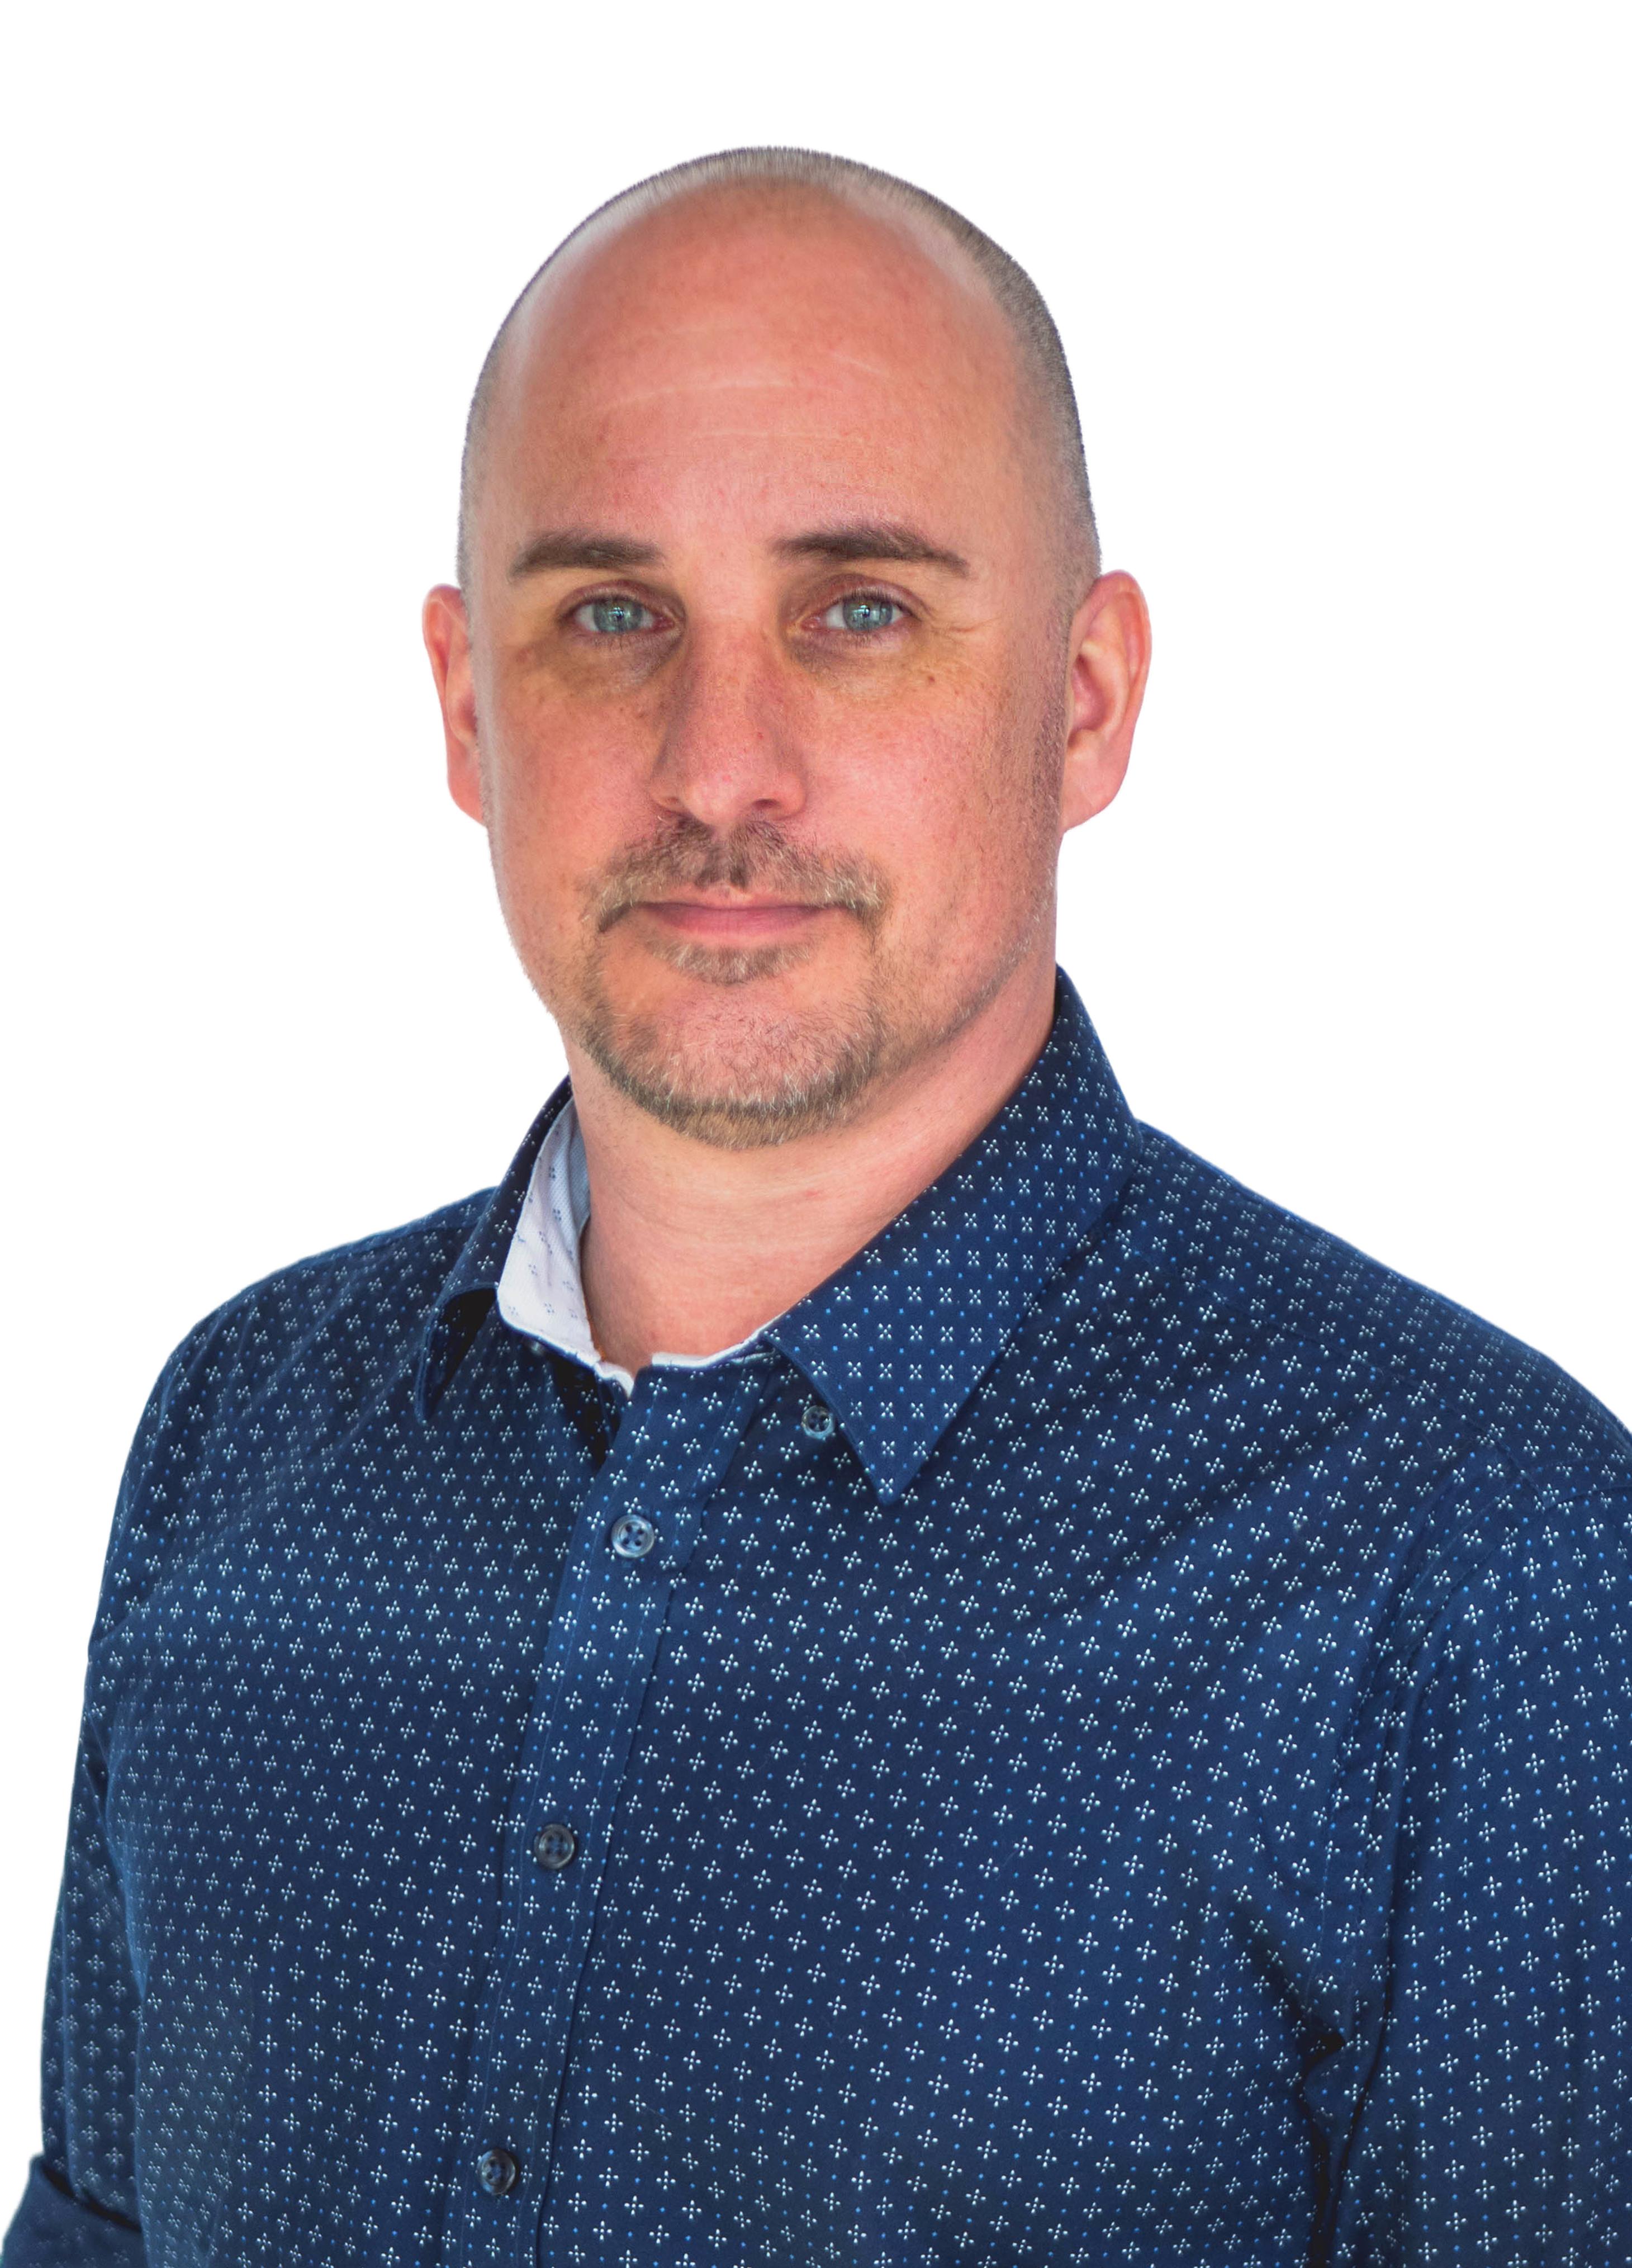 Darren Clifton Service Manager